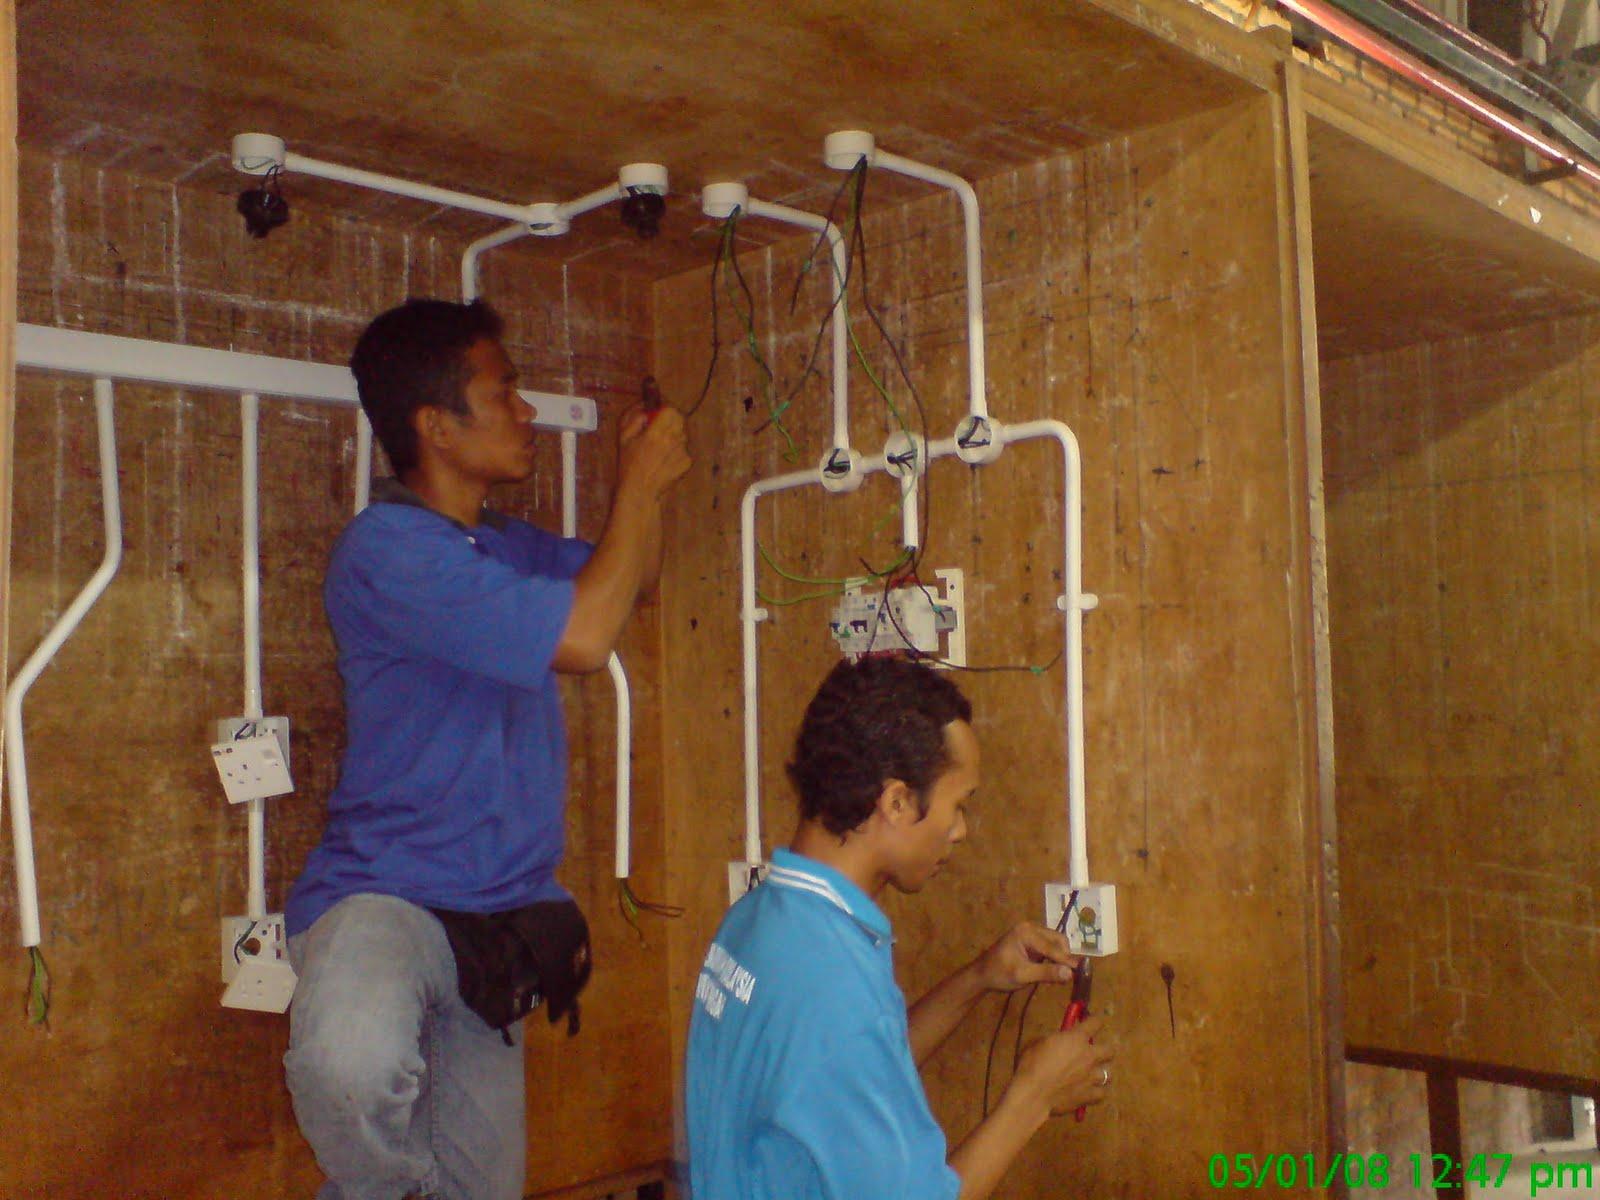 Sesi pembelajaran asas kerja-kerja pendawaian Elektrik : belajar wiring elektrik - yogabreezes.com